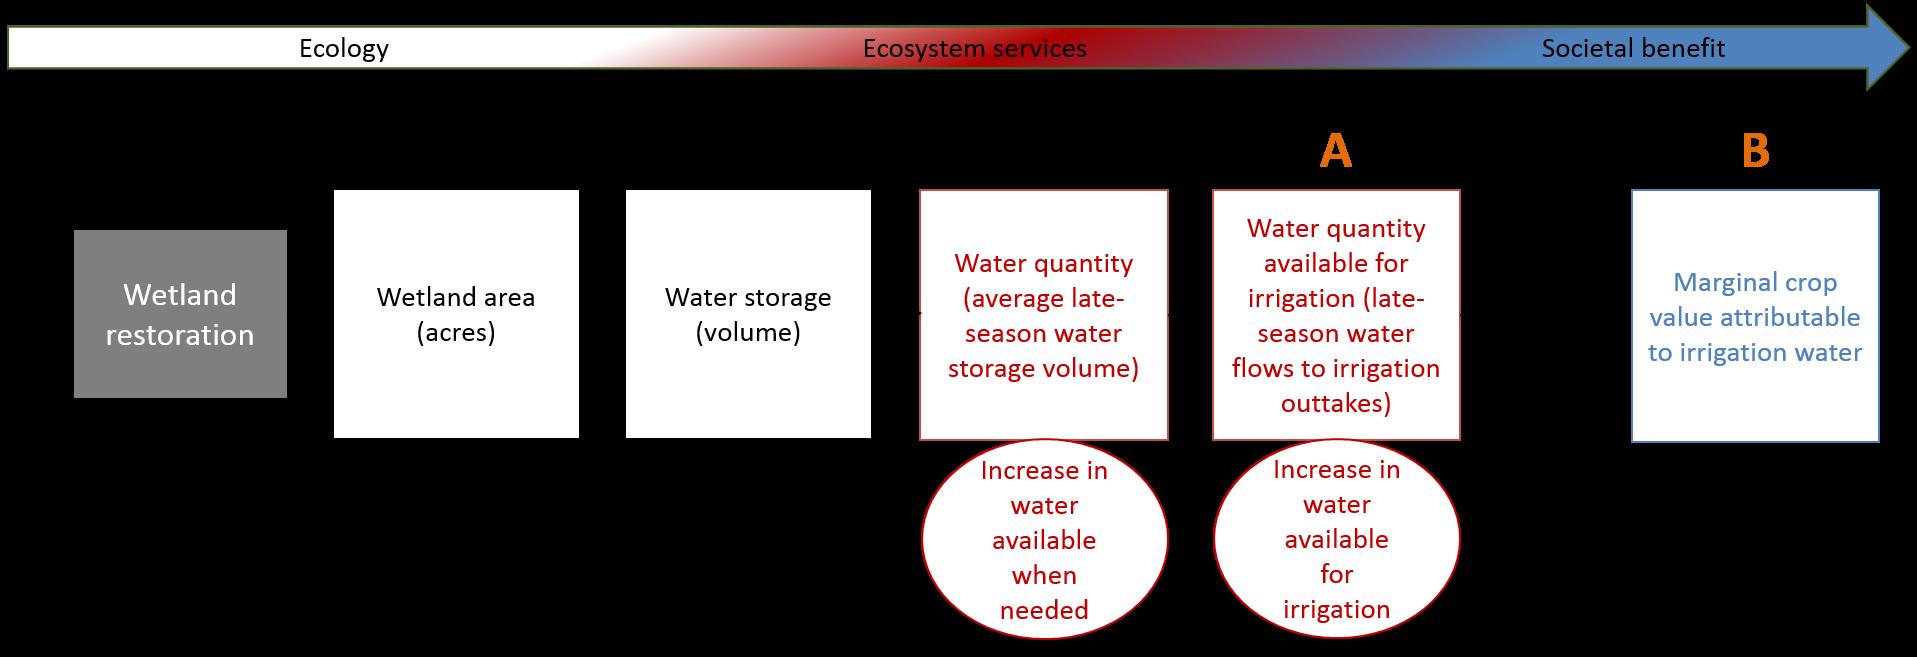 Fig3b_MethodsOverview_WetlandRestCausalChain